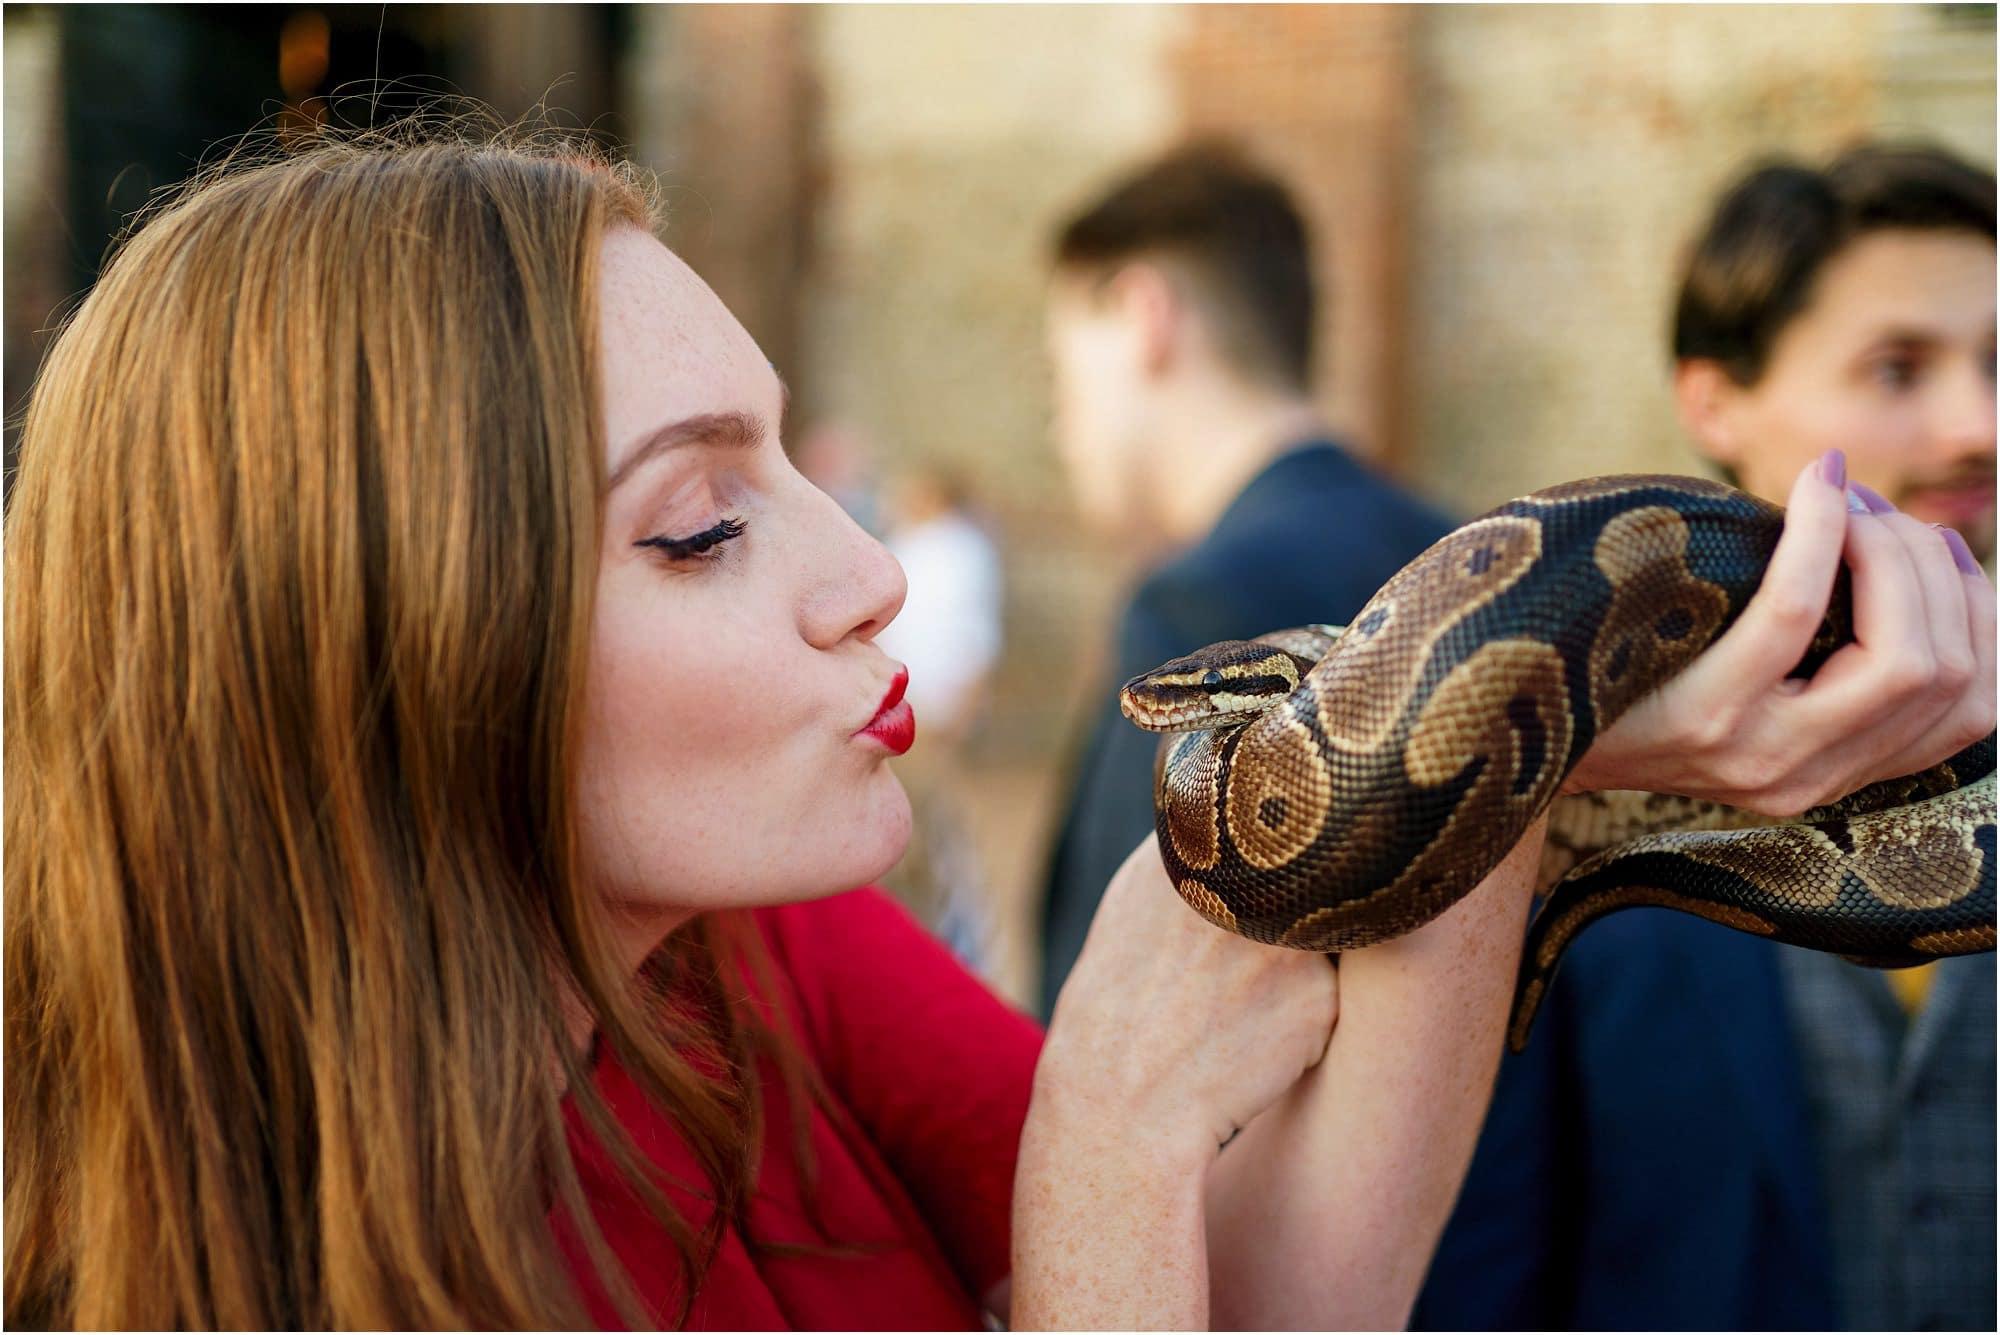 lady kissing a snake